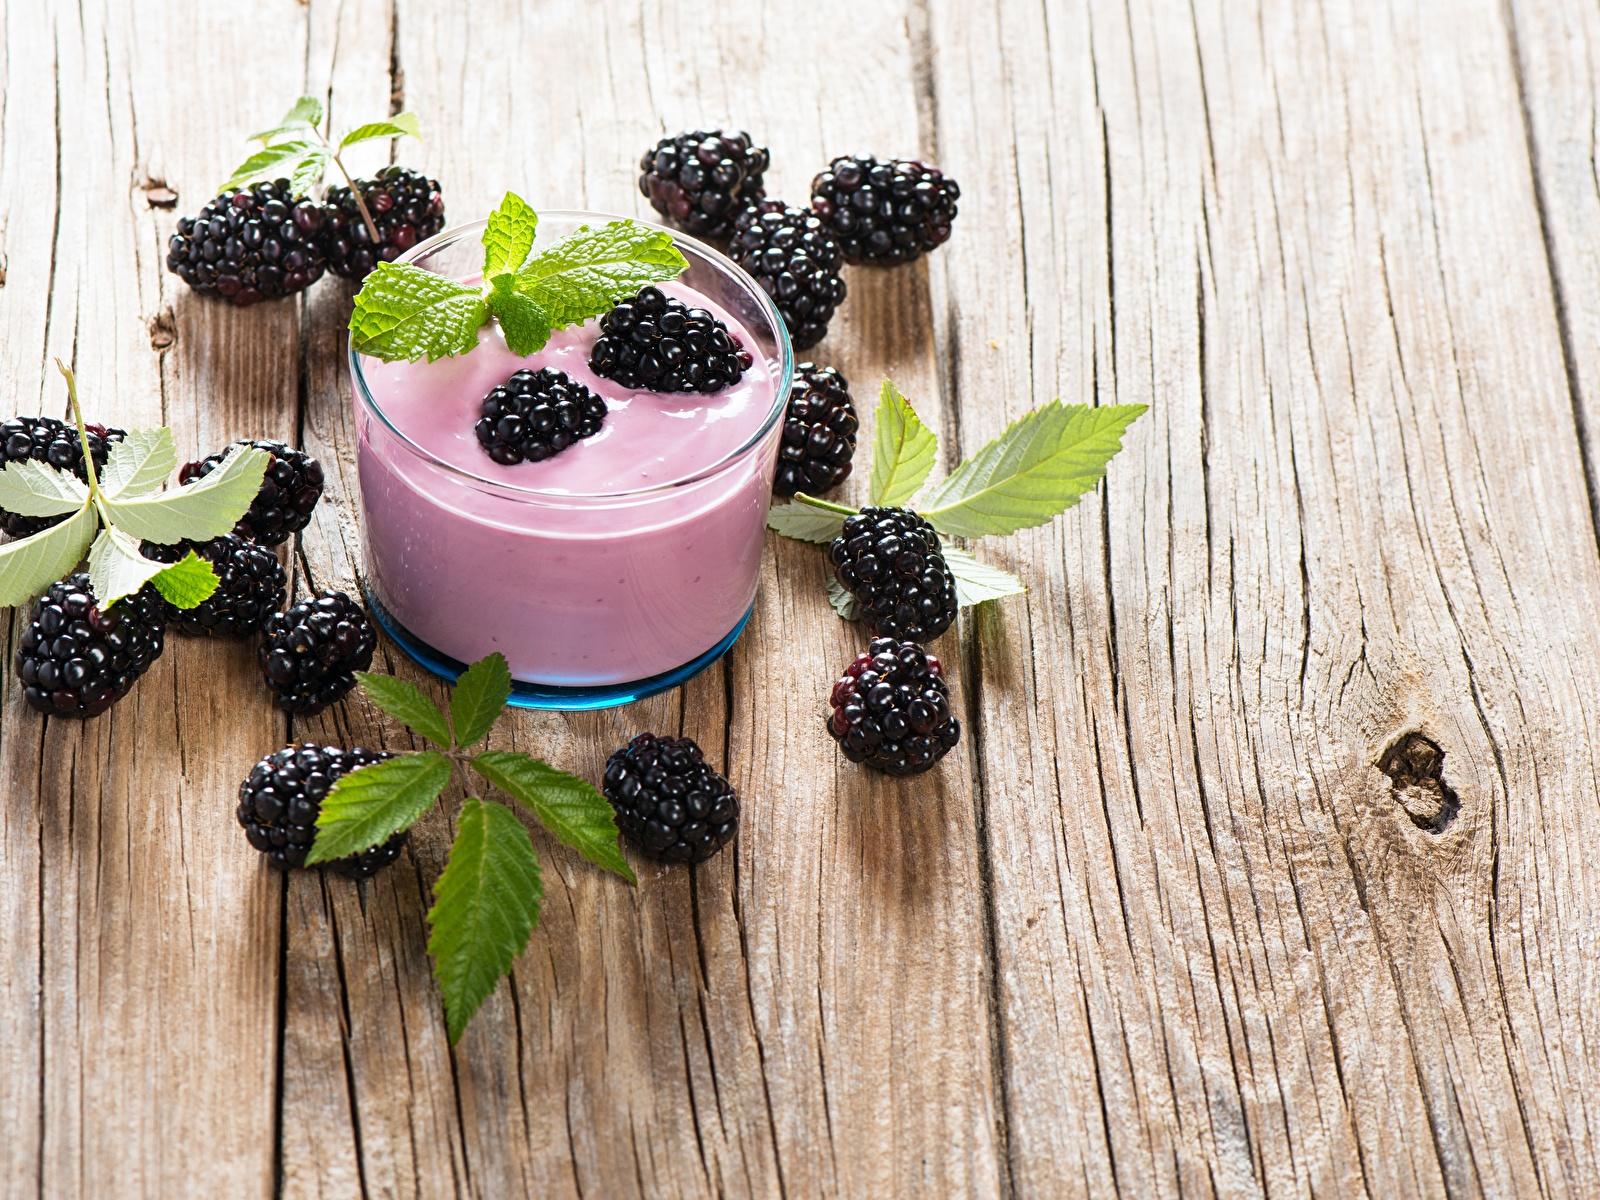 Картинки Йогурт стакана Ежевика Пища Доски 1600x1200 Стакан стакане Еда Продукты питания